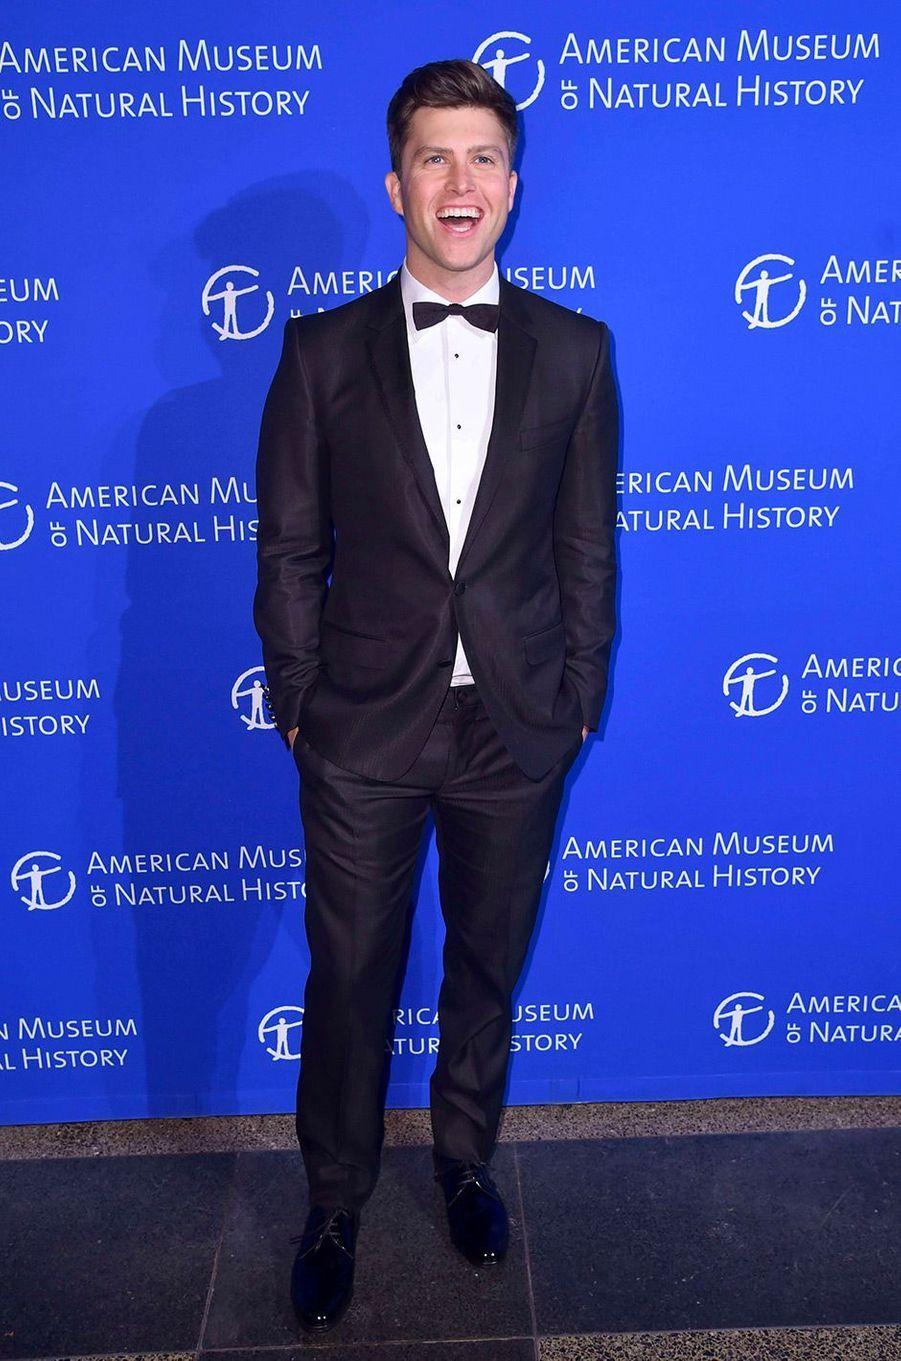 Colin Jost au gala de l'American Museum of Natural History, à New York, le 30 novembre 2017